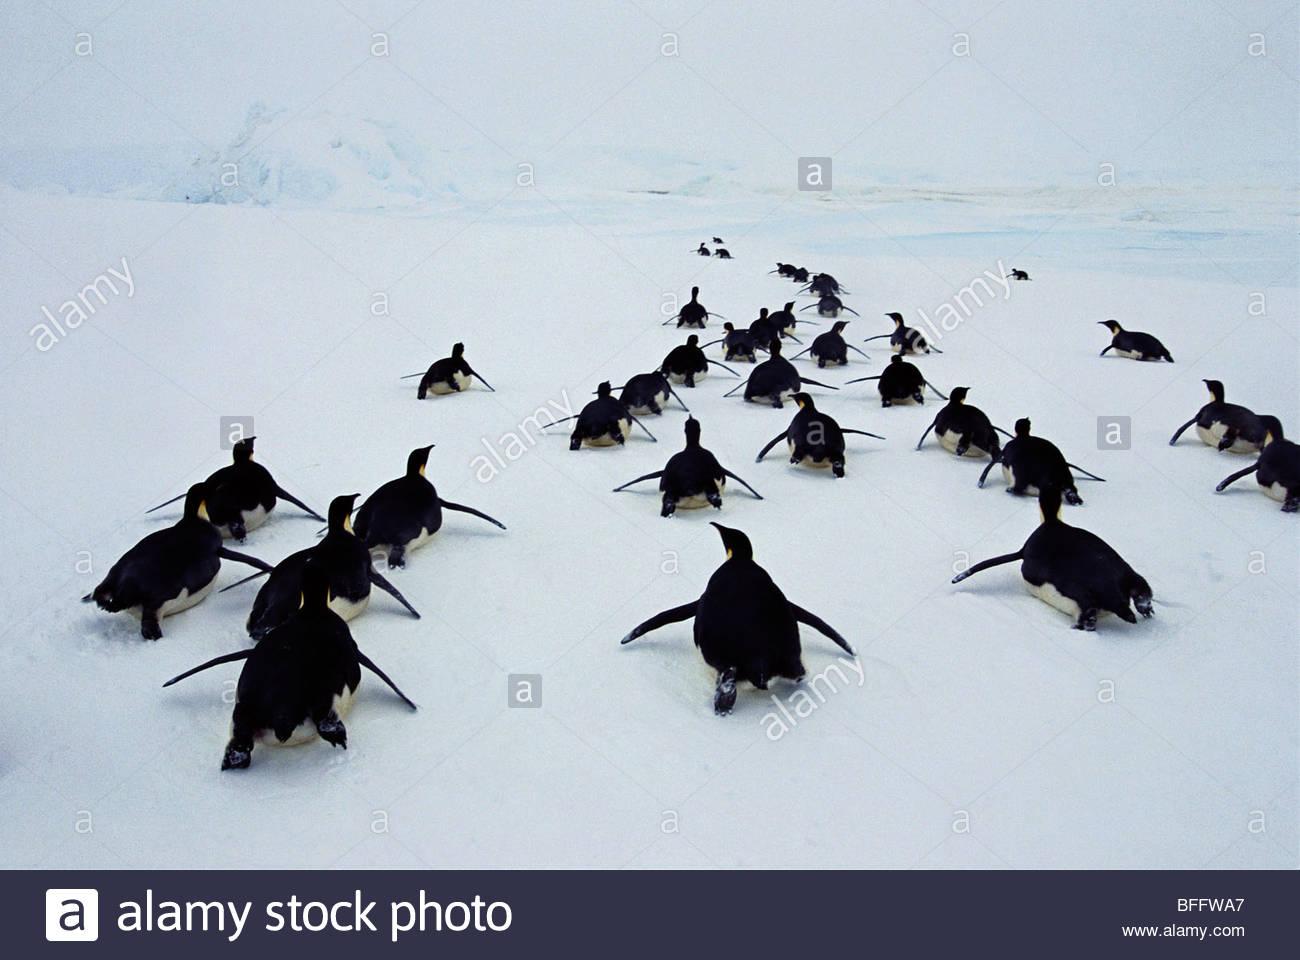 Emperor penguins tobogganing, Aptenodytes forsteri, Weddell Sea, Antarctica - Stock Image